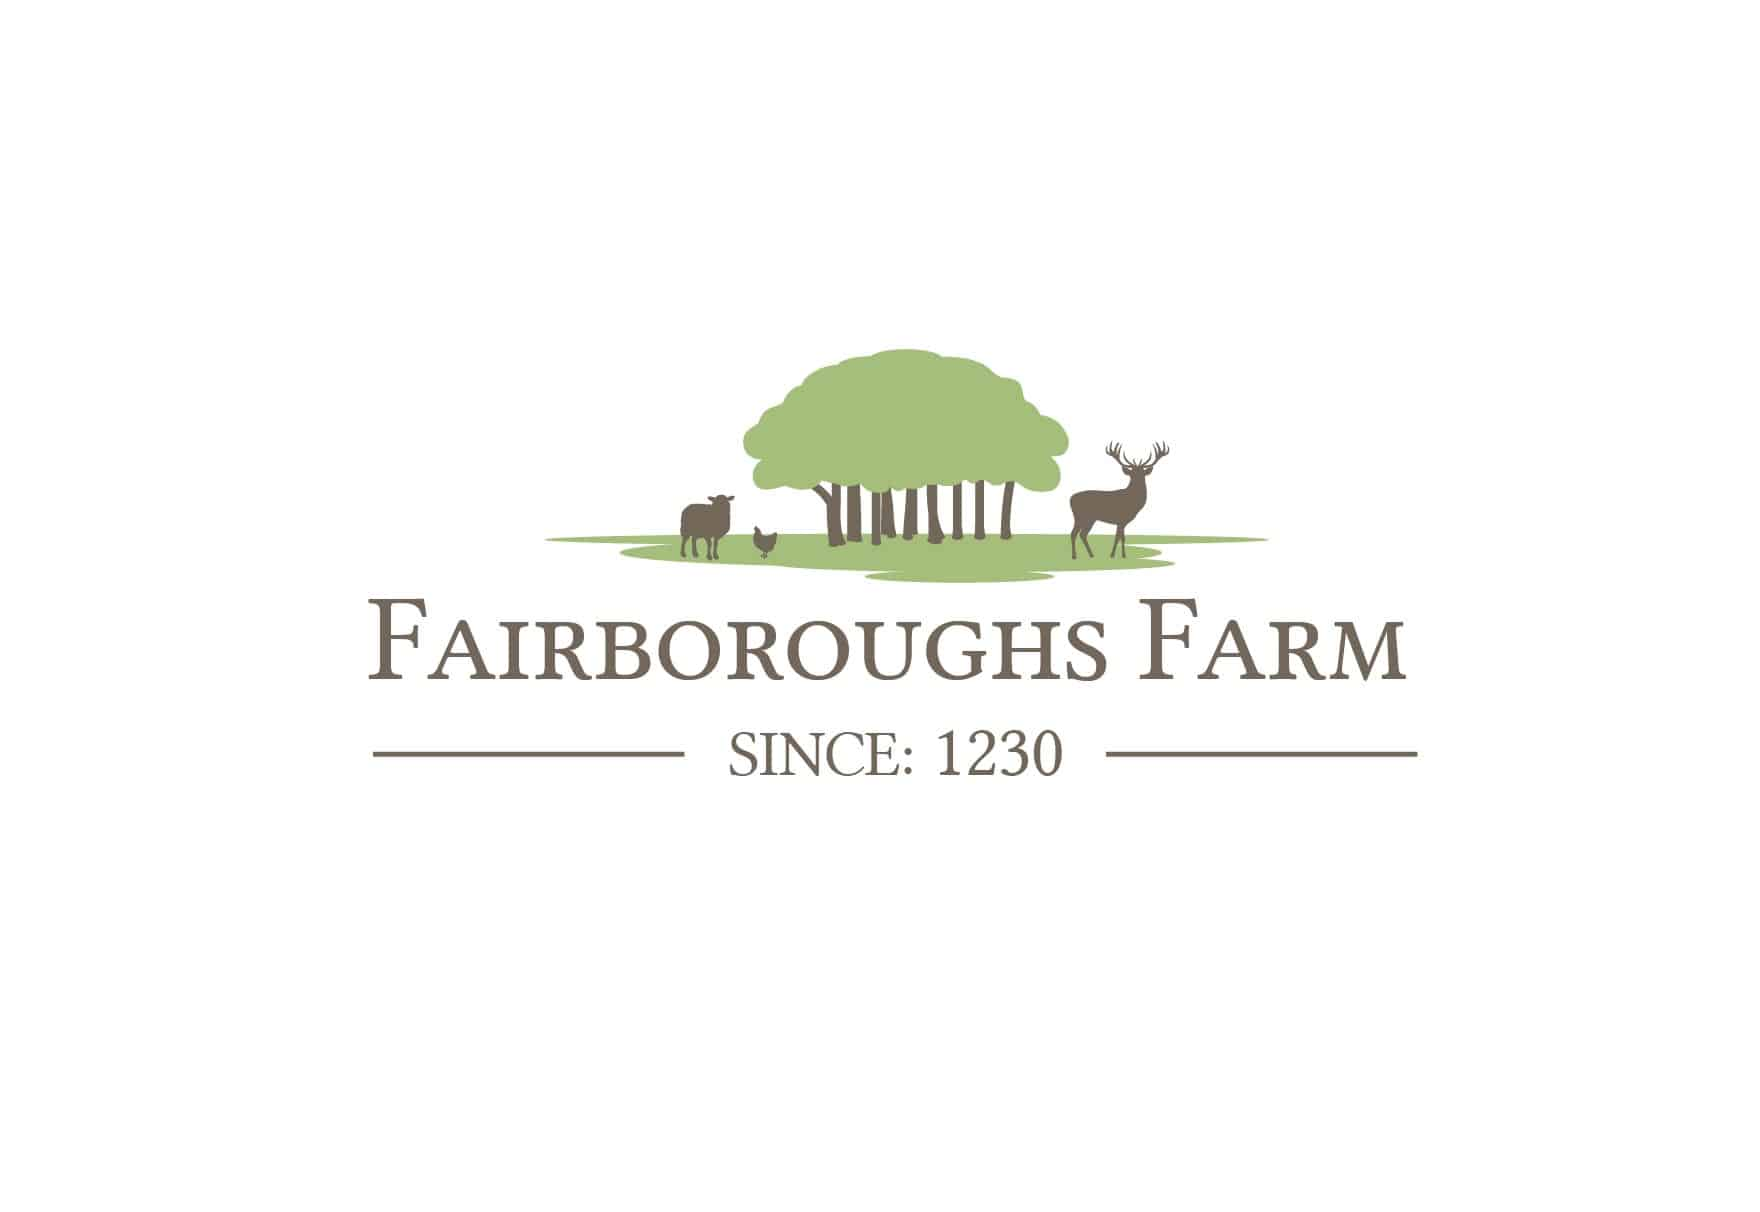 fairboroughs-farm-logo-design